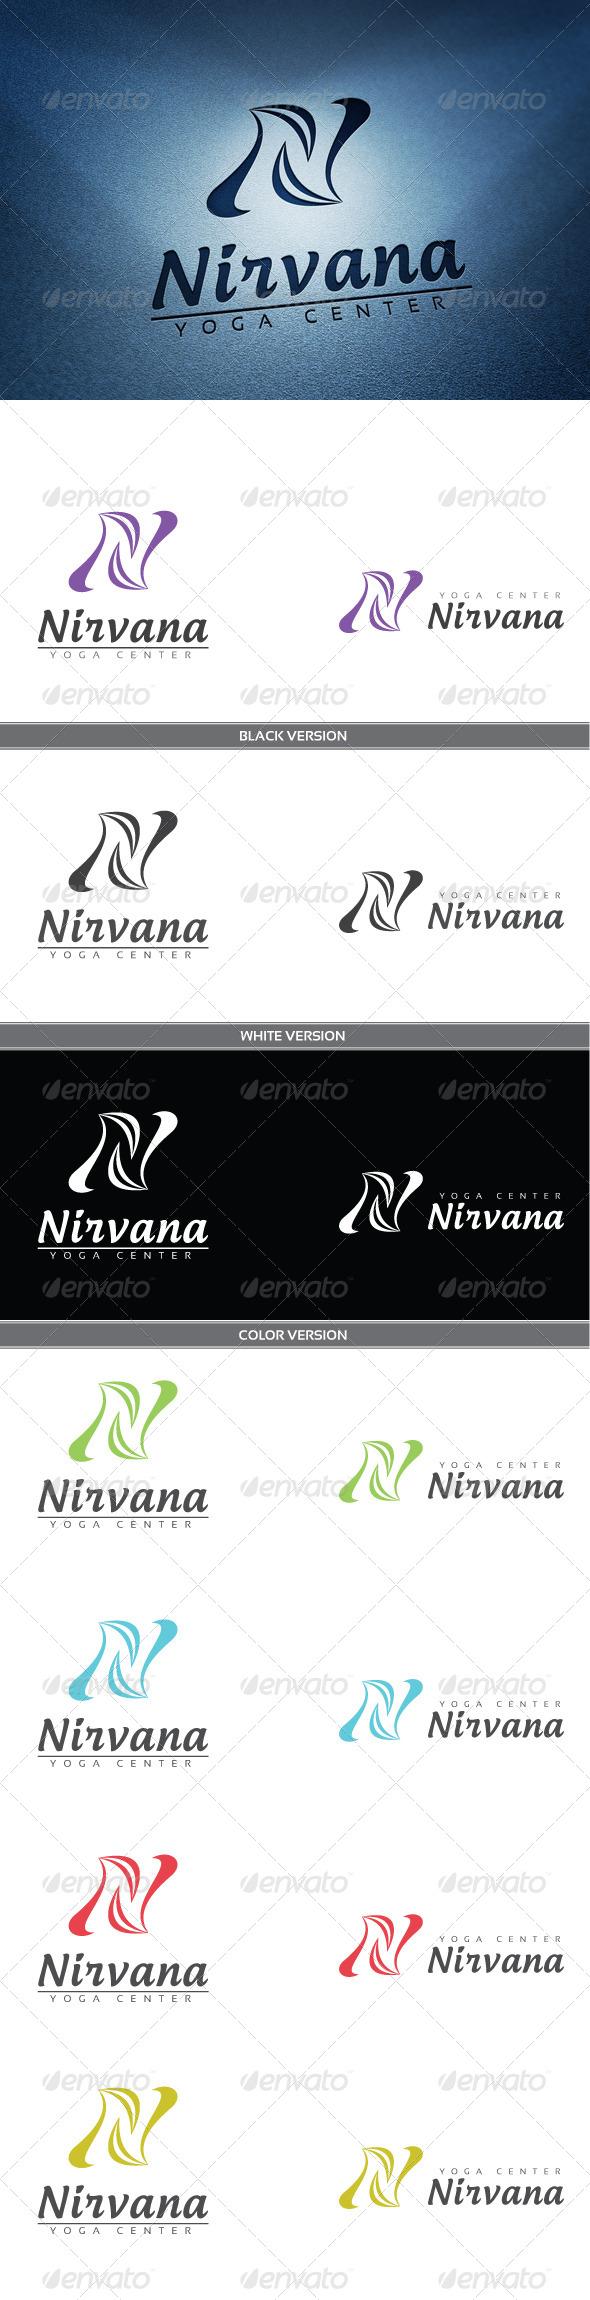 Nirvana - Letters Logo Templates